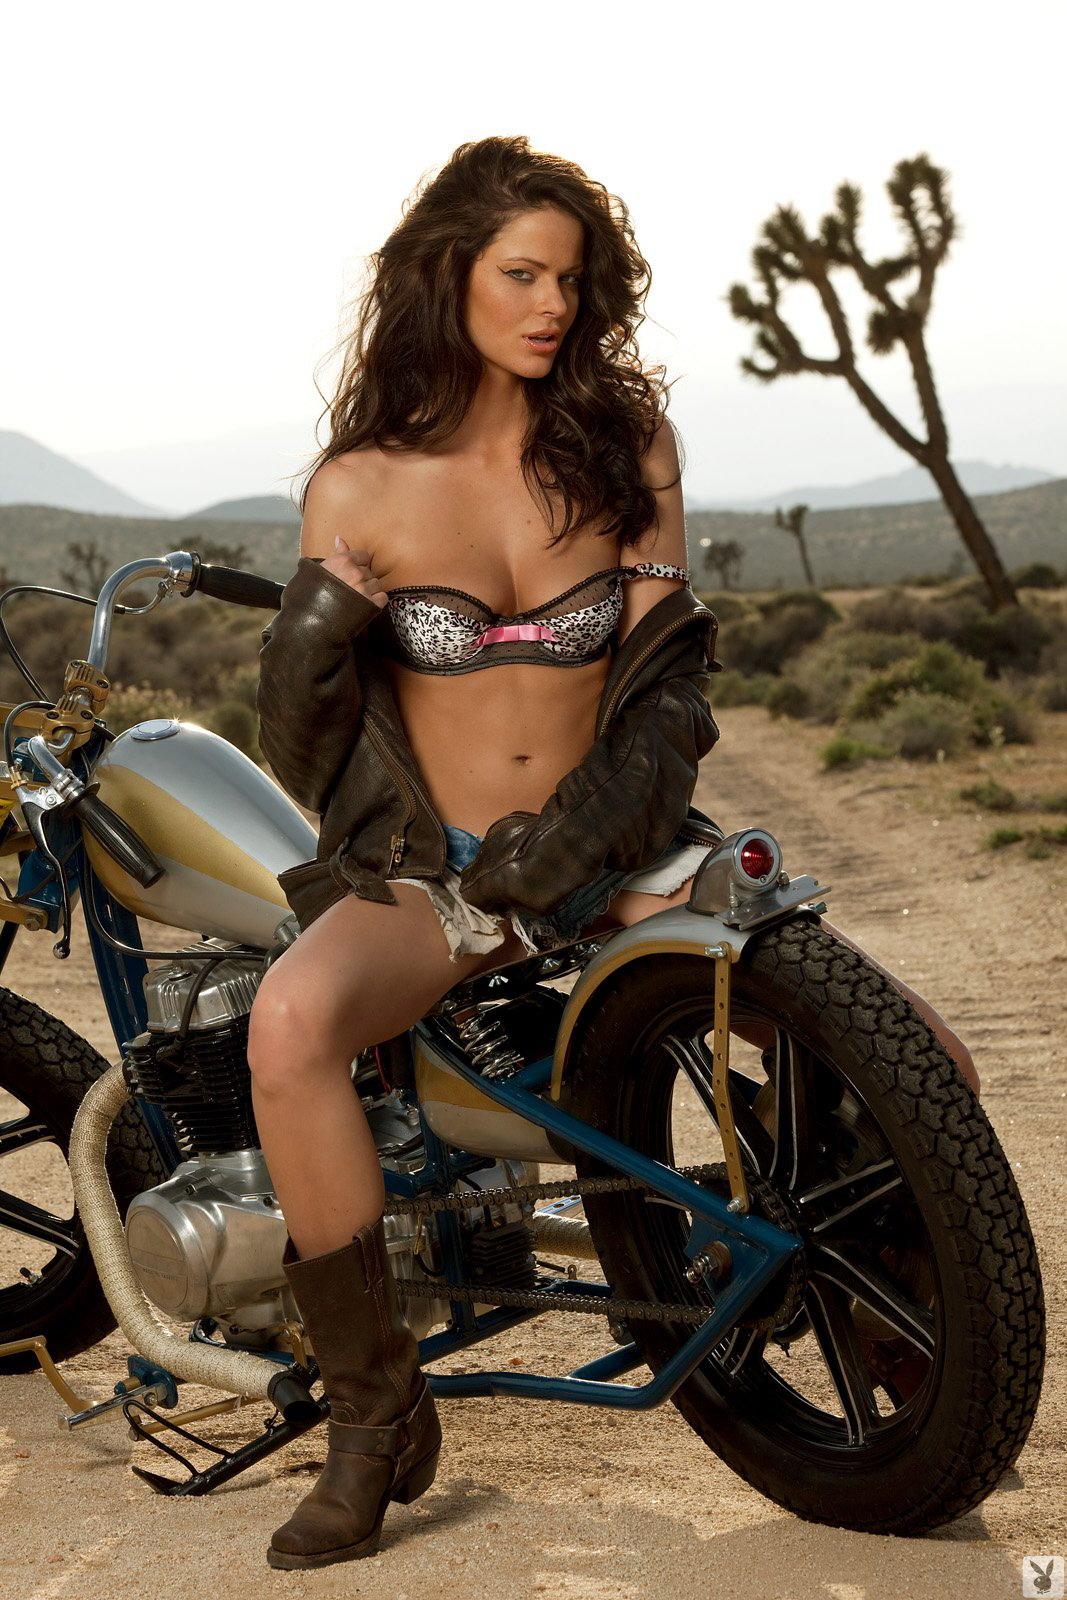 КОНКУРЕНЦИЈА - Page 3 Bsa-girl-motorbike-motographite-3